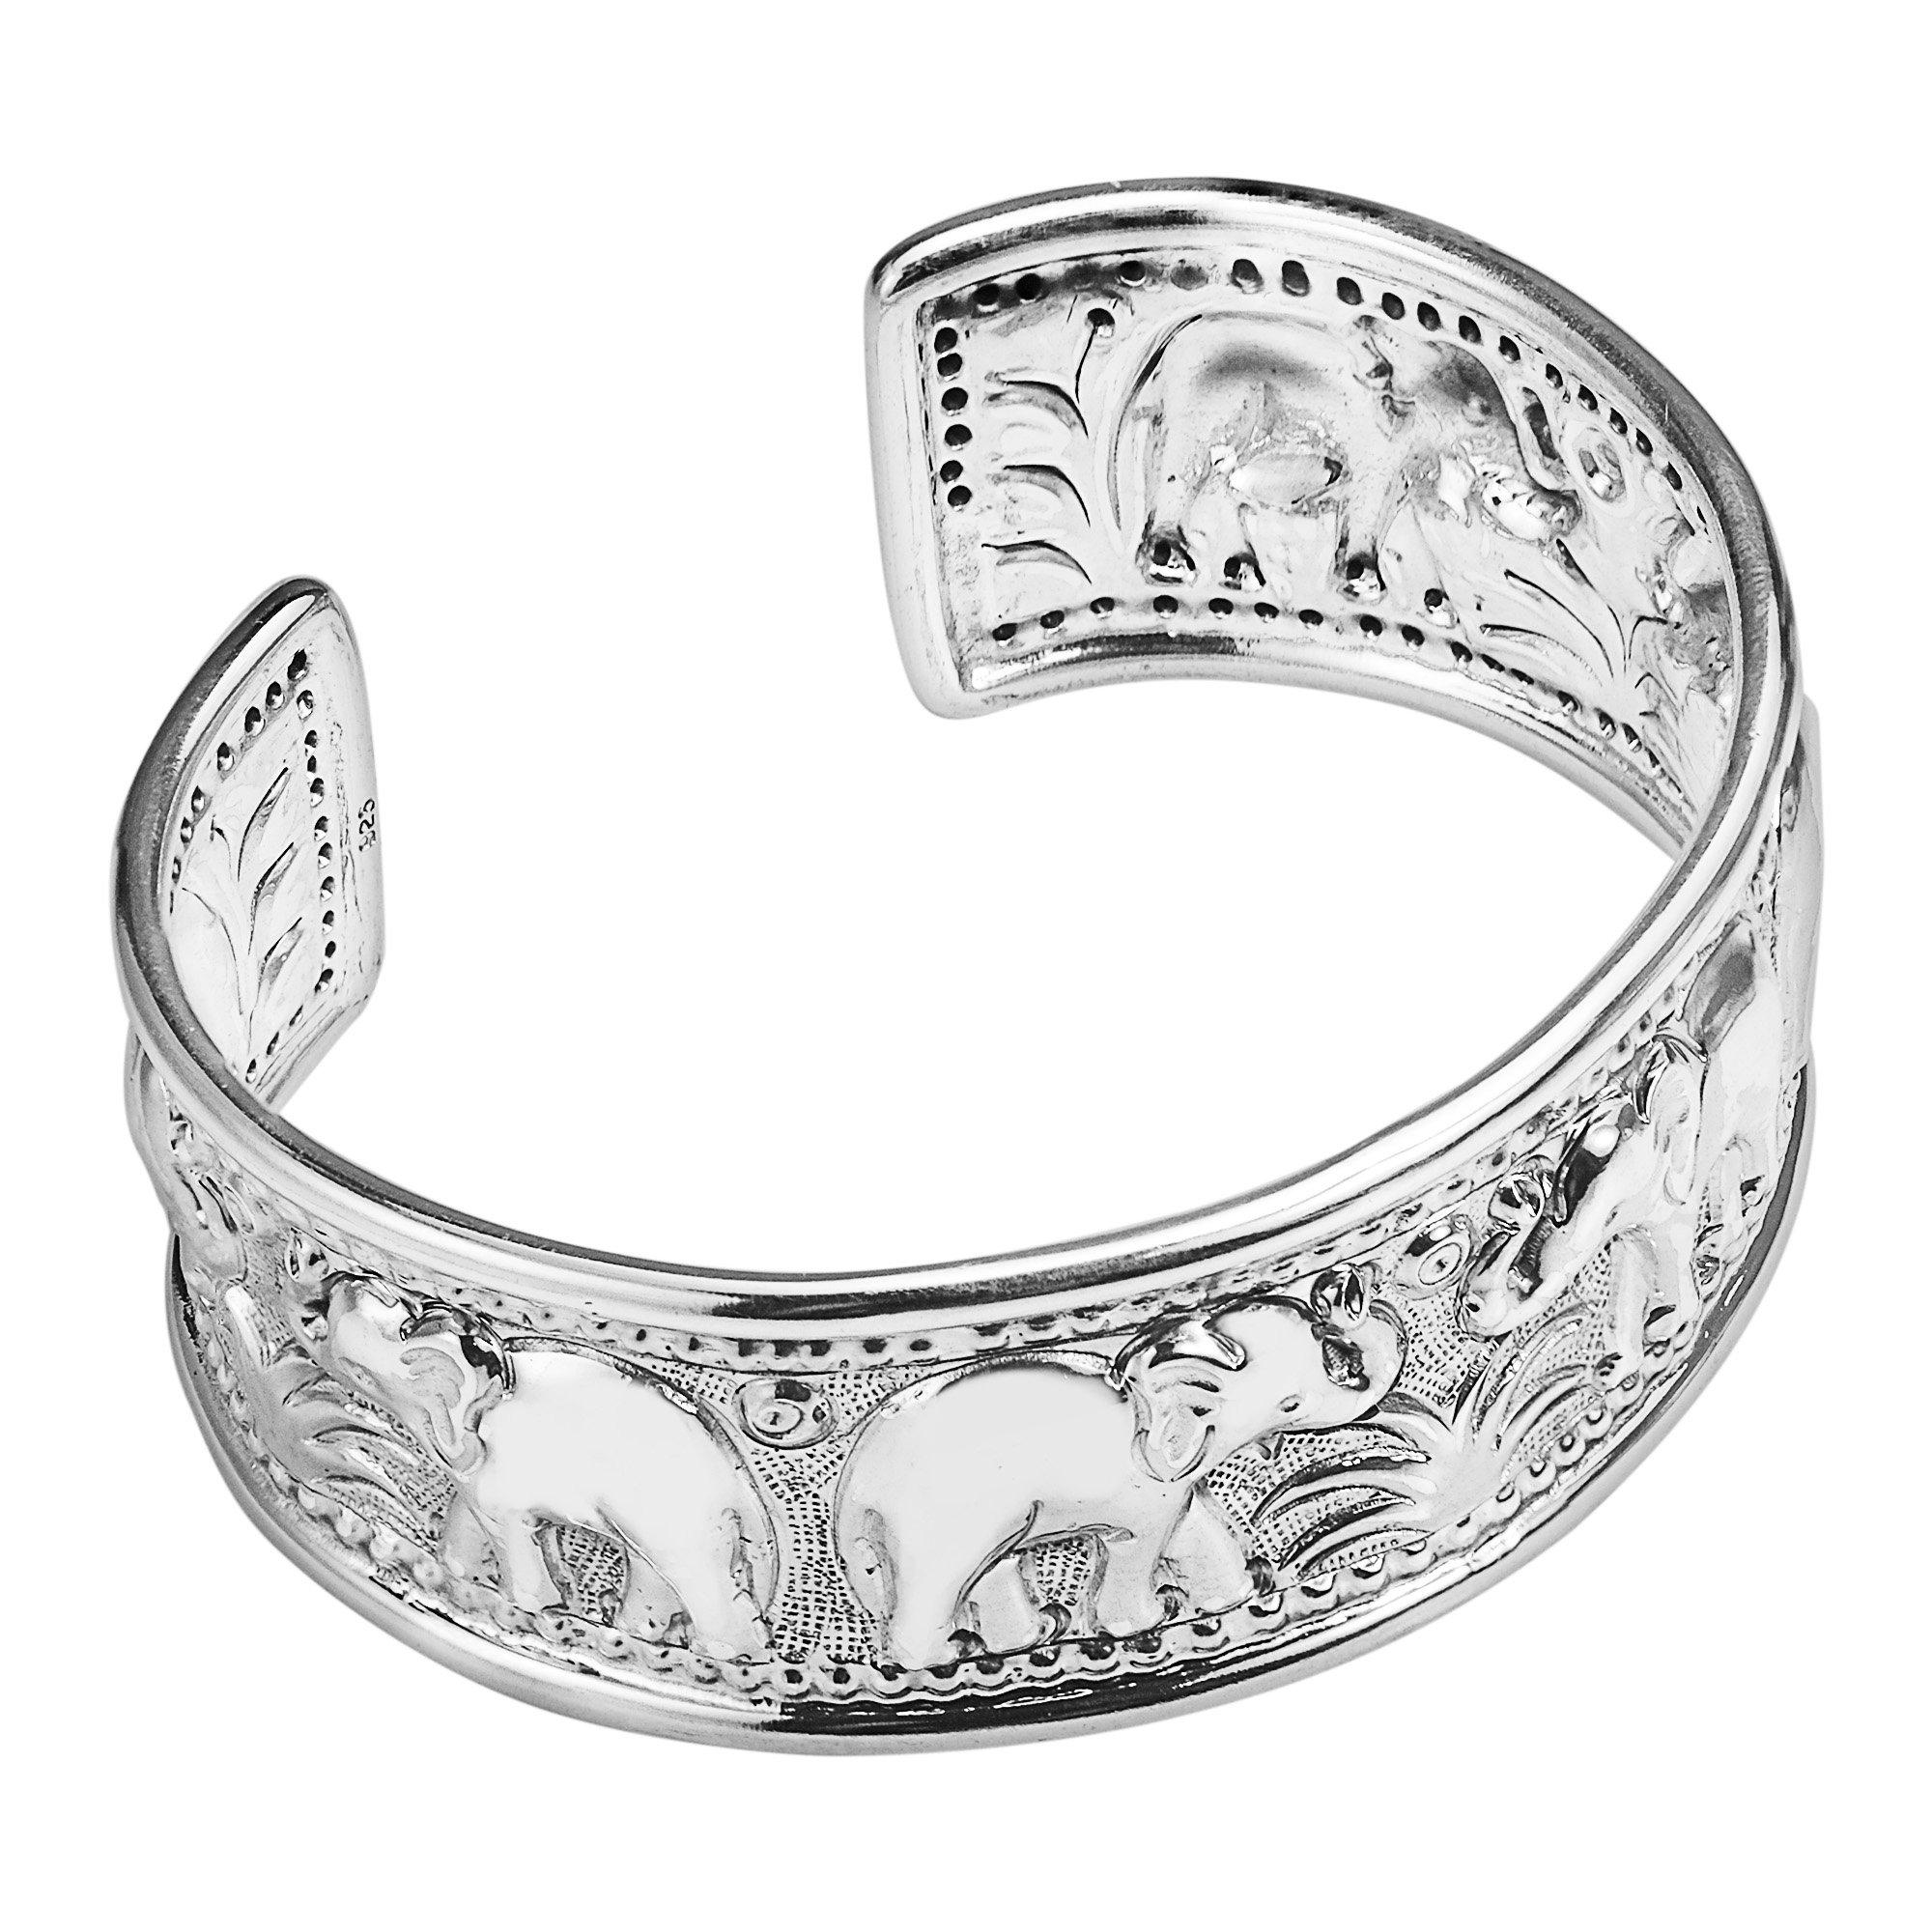 Elephant Jungle Trek Thai Yao Hill Tribe Fine Silver Adjustable Cuff Bracelet by AeraVida (Image #2)